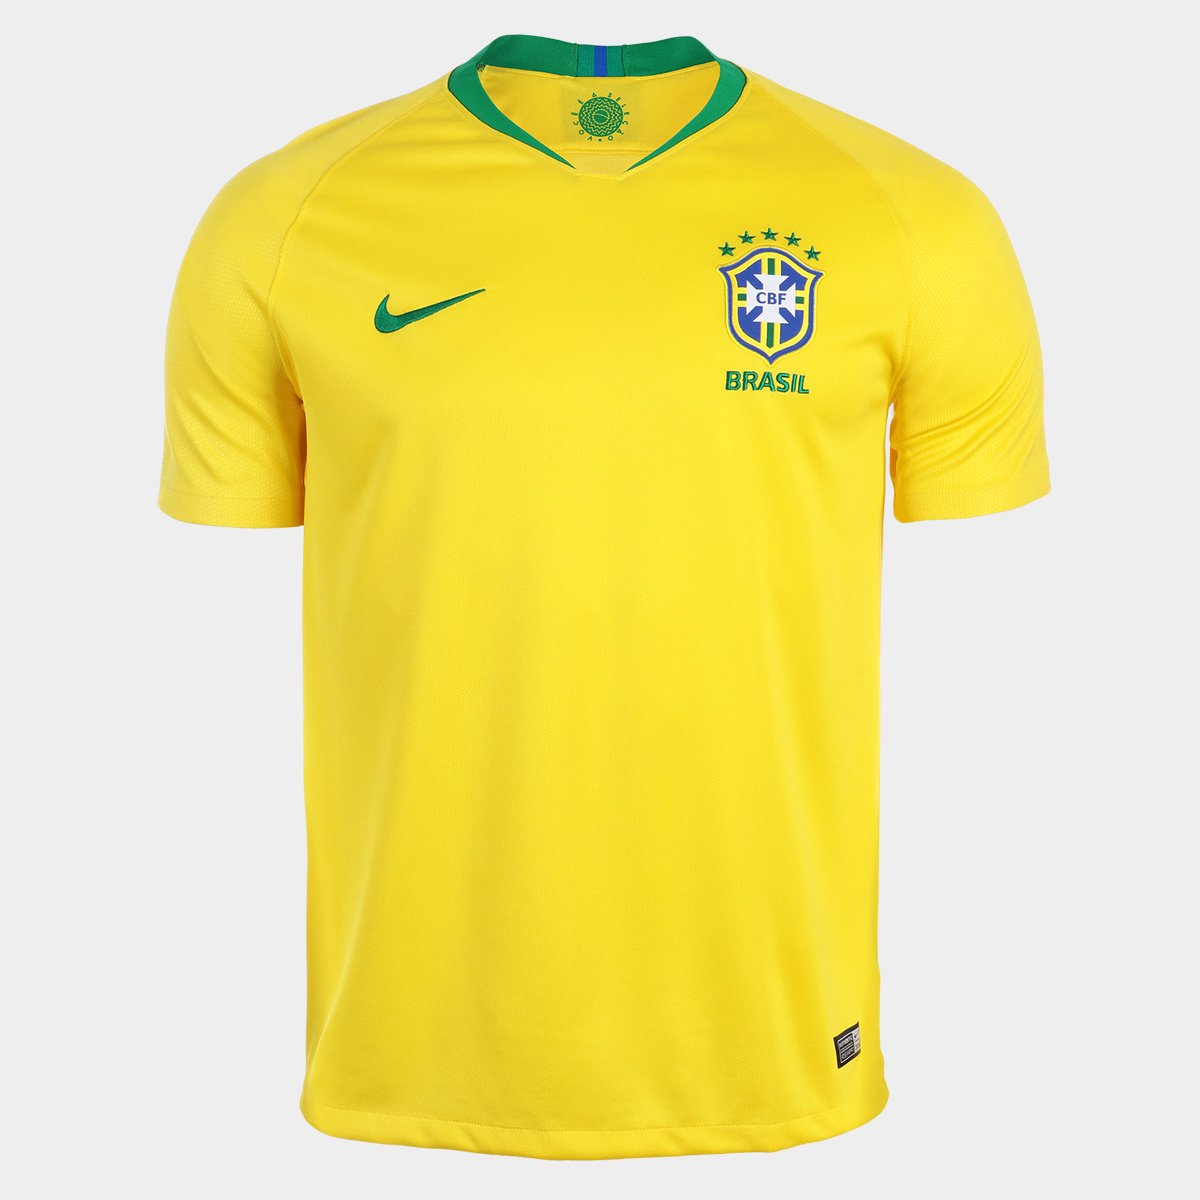 9bfe490a84 ... Camisa Seleção Brasil I 2018 nº 5 Casemiro - Torcedor Nike Masculina ...